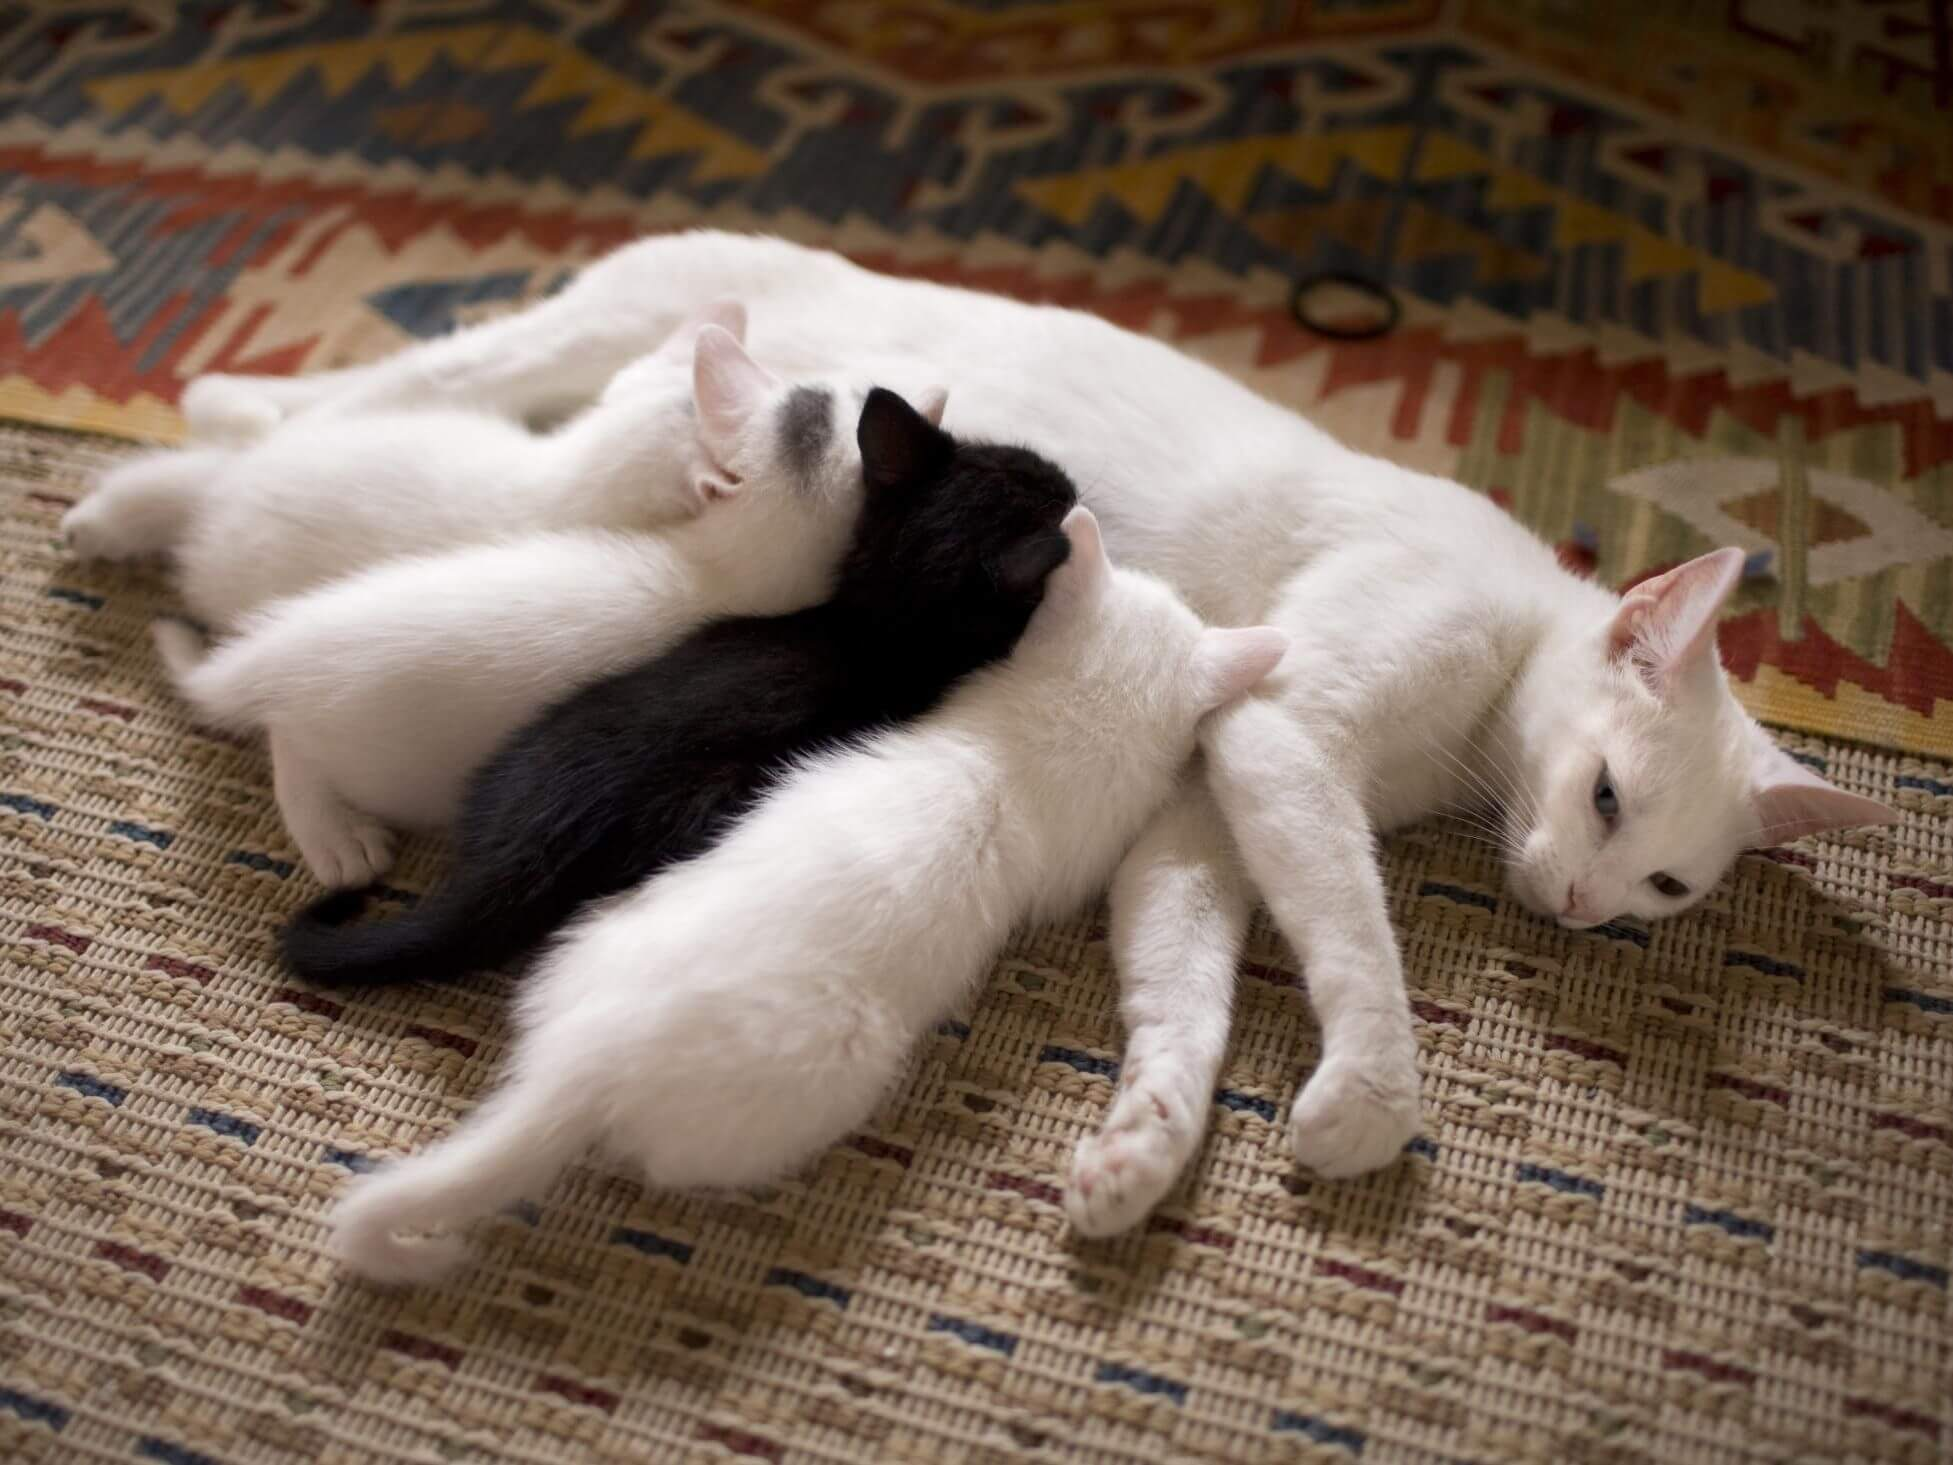 Cara Merawat Bayi Kucing 1 Bulan: Pastikan Kucing Disusui Oleh Induk